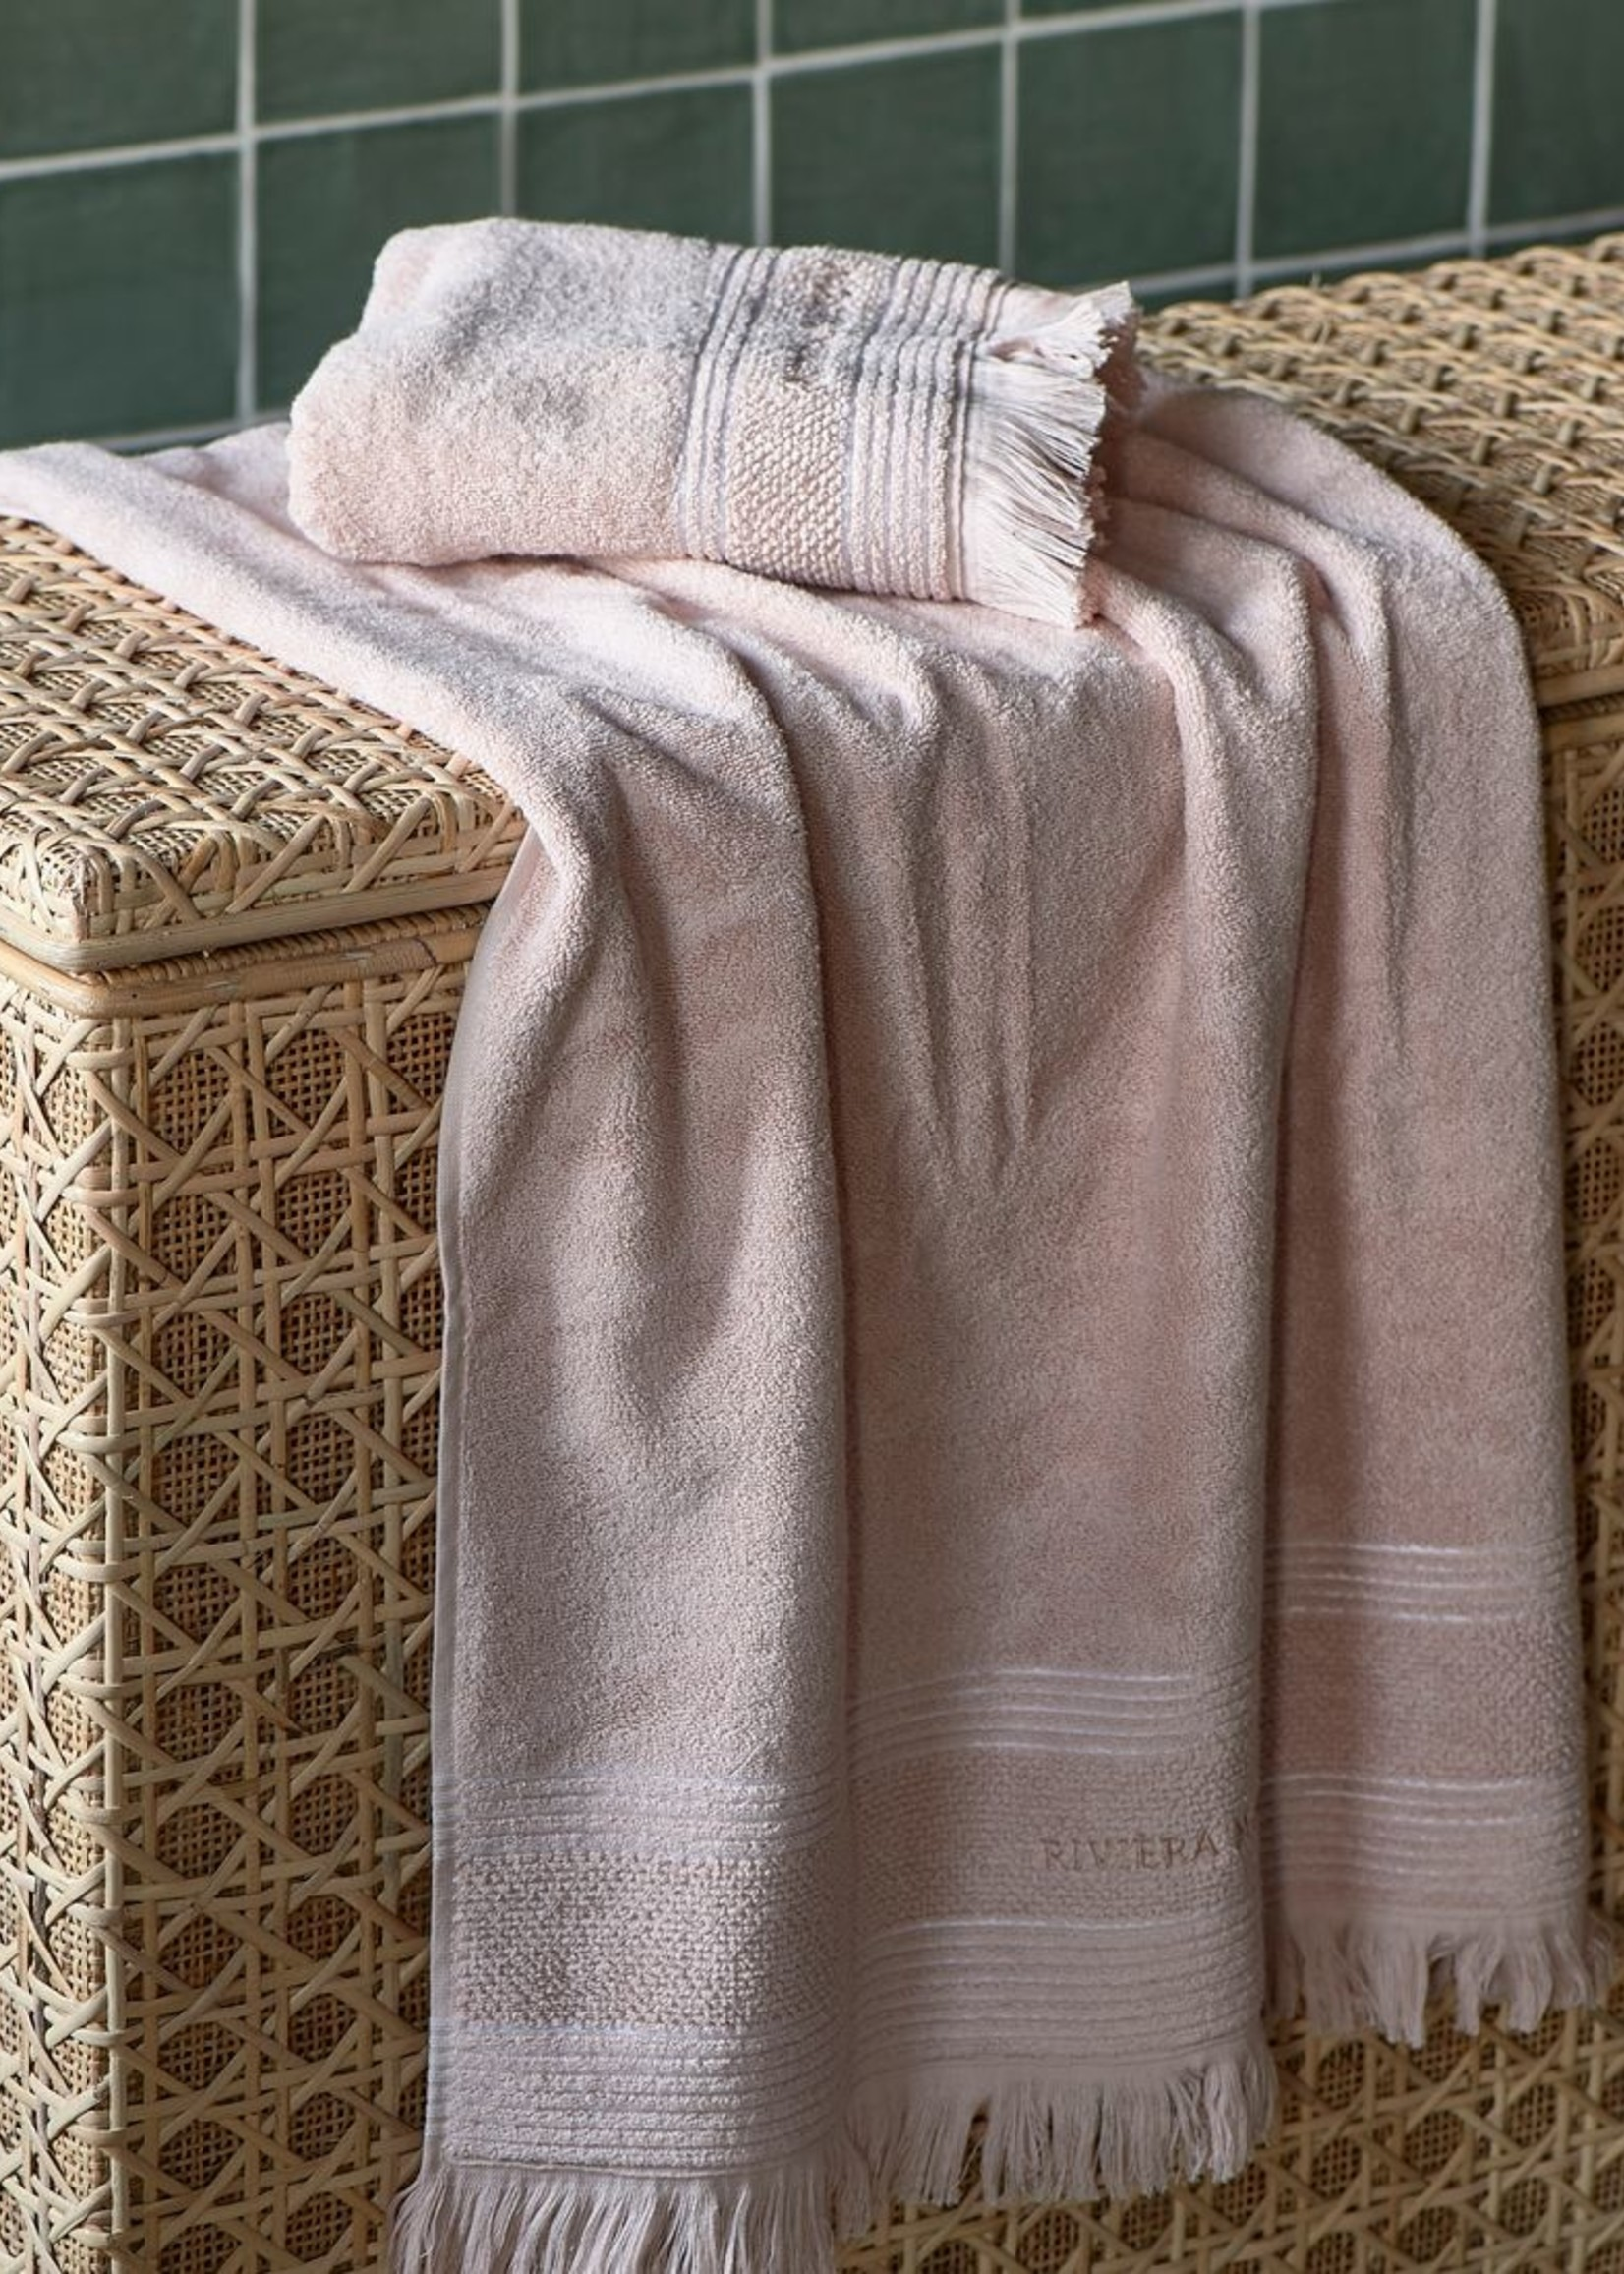 Riviera Maison Serene Towel blossom 140x70